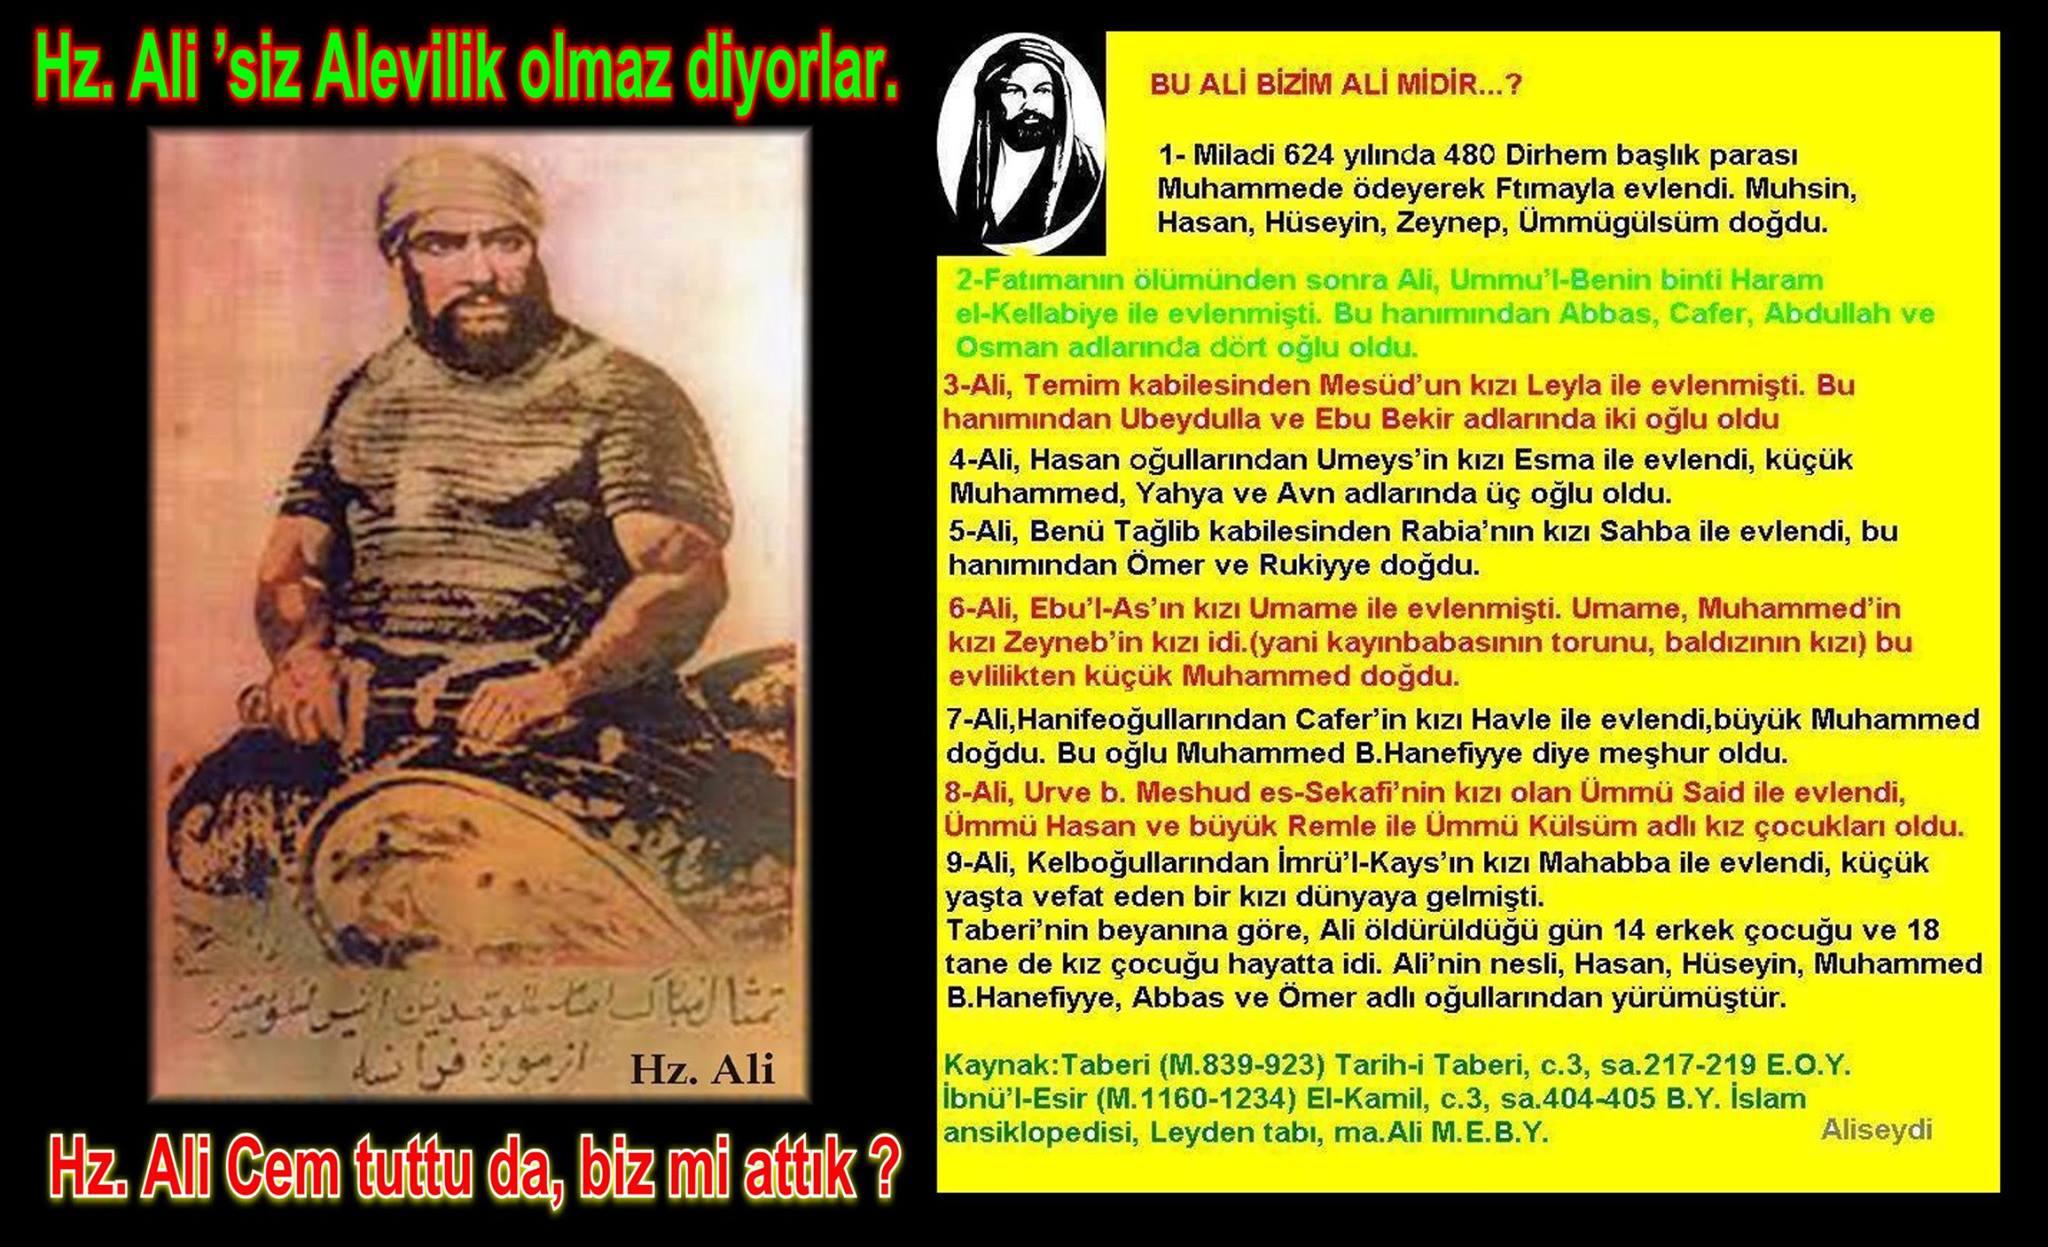 12 Hz imam Ali divani Alevi bektasi kizilbas pir sultan cemevi cem semah devrimci aleviler birligi DAB Feramuz Sah Acar cem